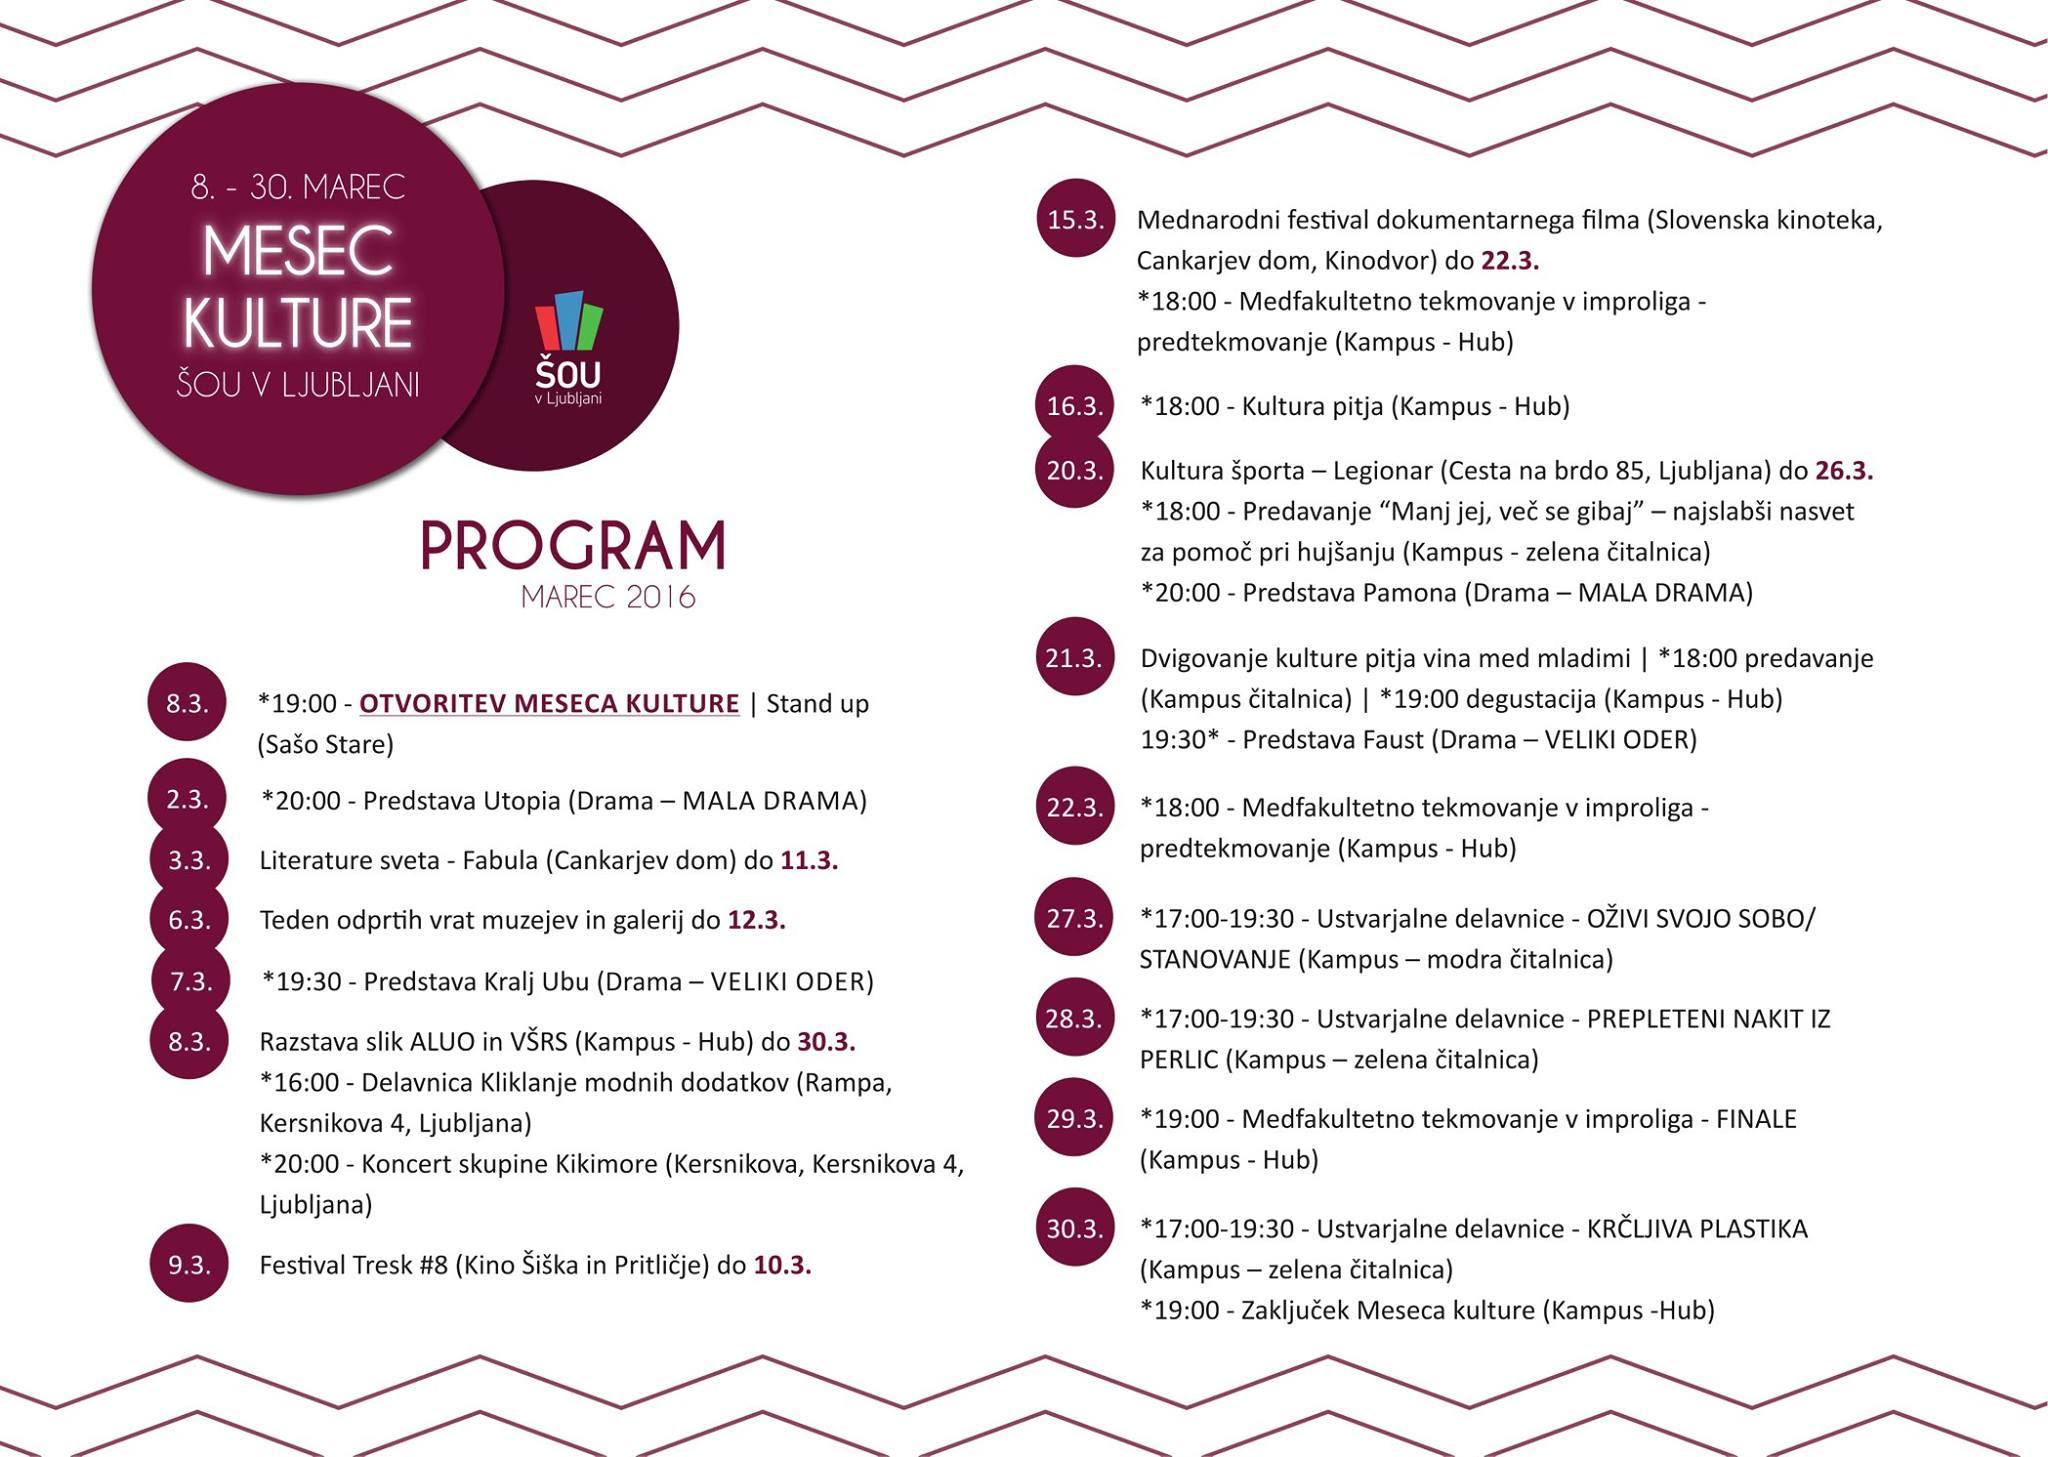 mesec_kulture_2017.jpg